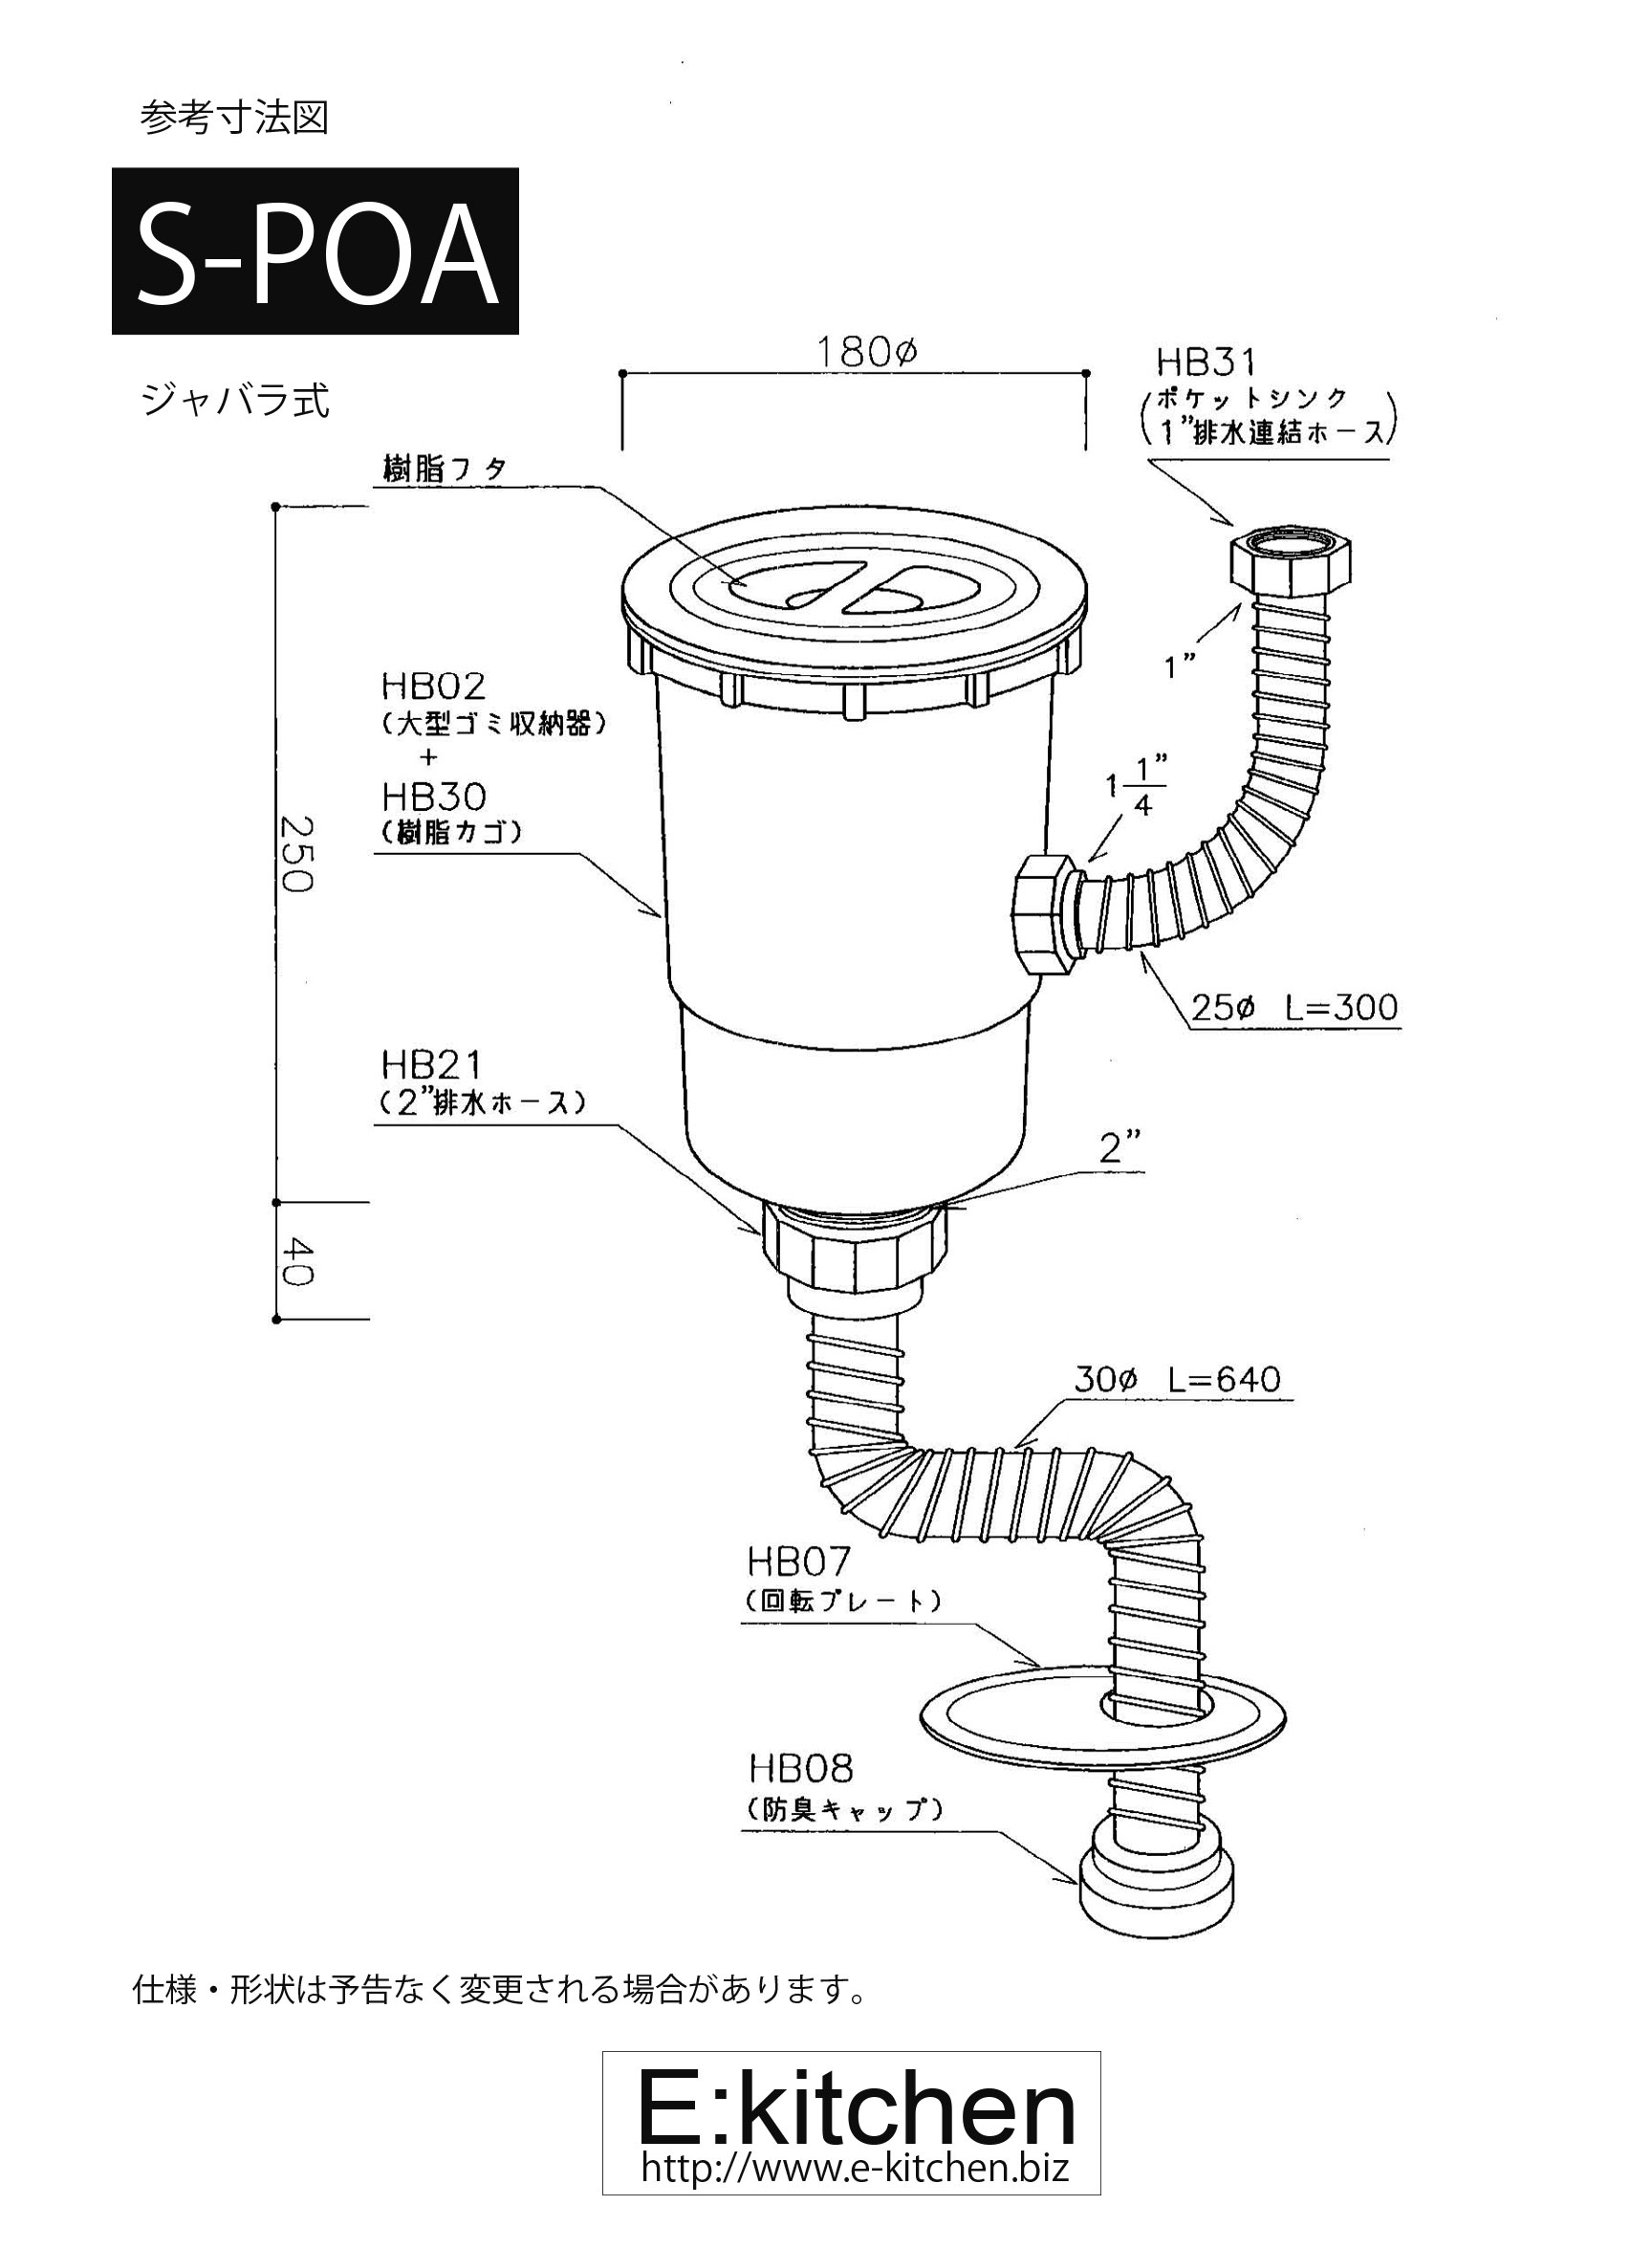 CKシリーズ 排水部品S-POA